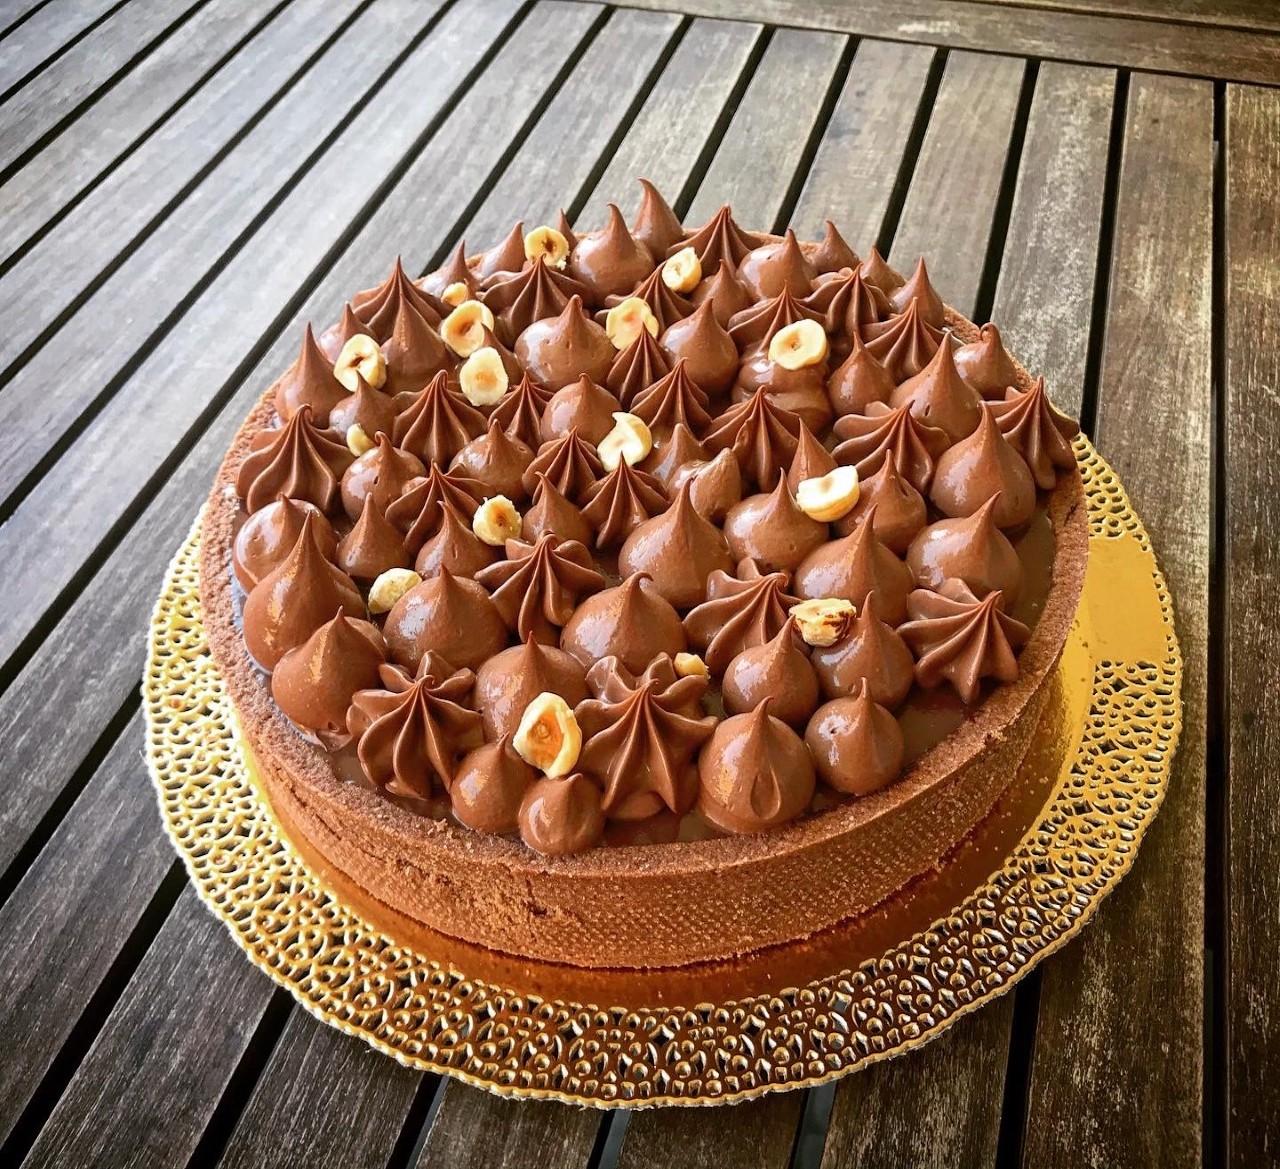 Crostata moderna nocciola e namelaka al cioccolato fondente